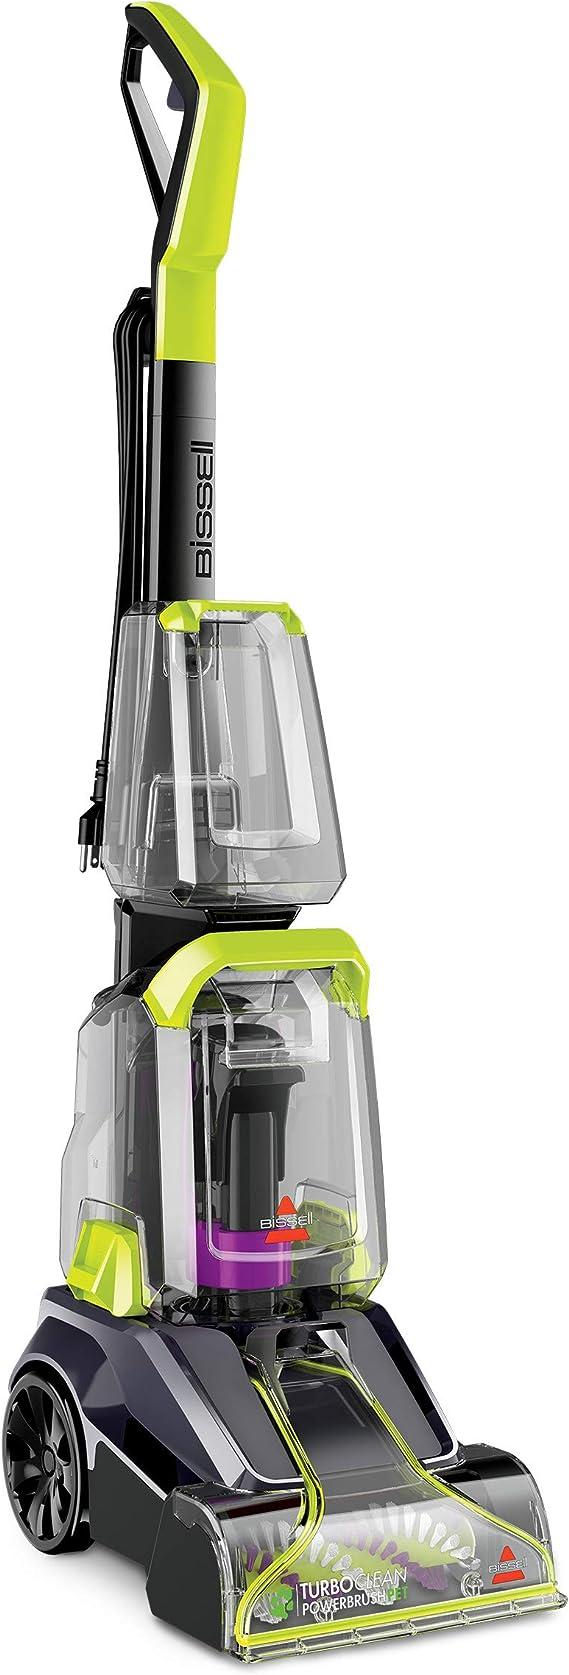 ghdonat.com Home & Kitchen Carpet Cleaning Machines Pet Formula ...